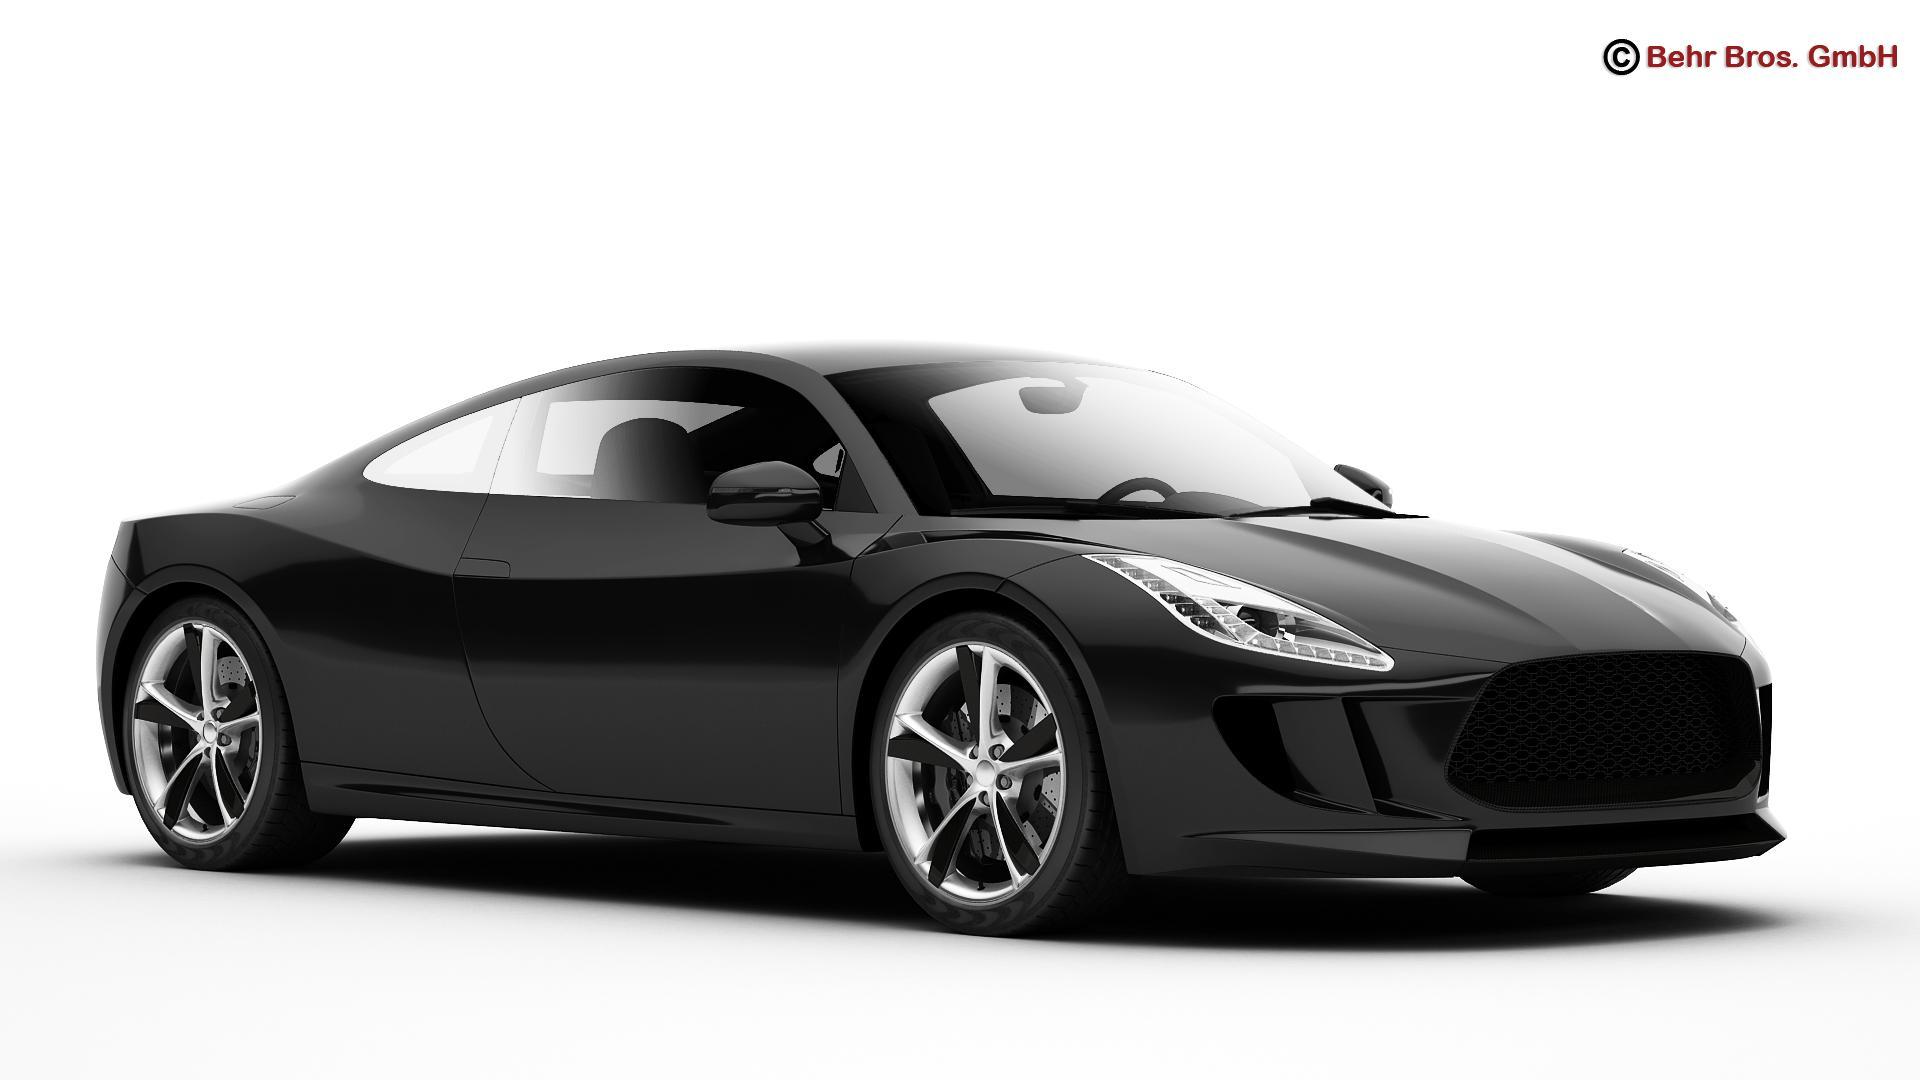 generic sports car 3d model 3ds max fbx c4d lwo ma mb obj 160526